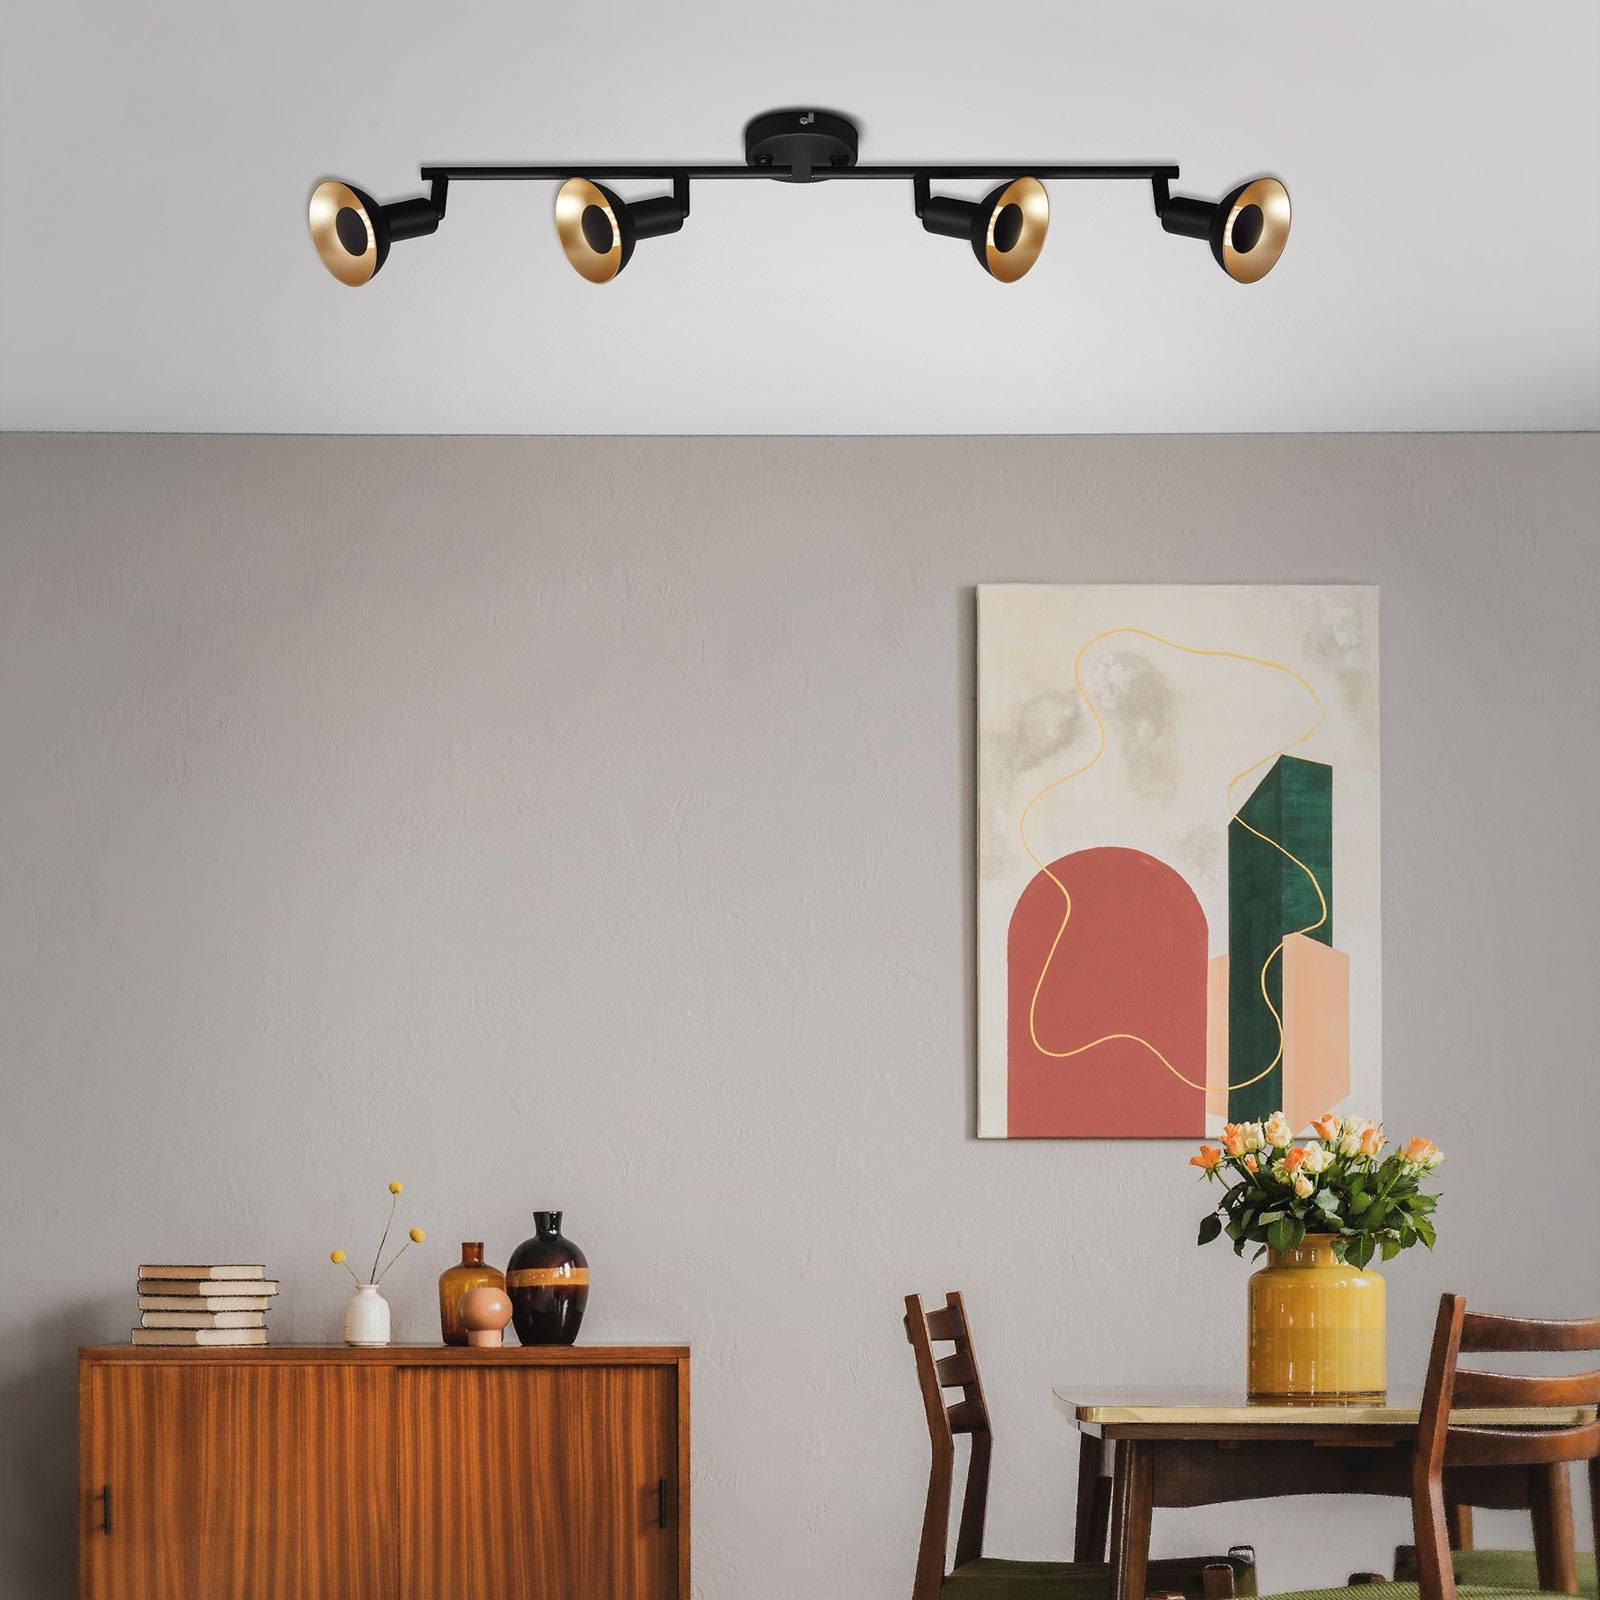 LED-taklampe Kukui, 4 lyskilder